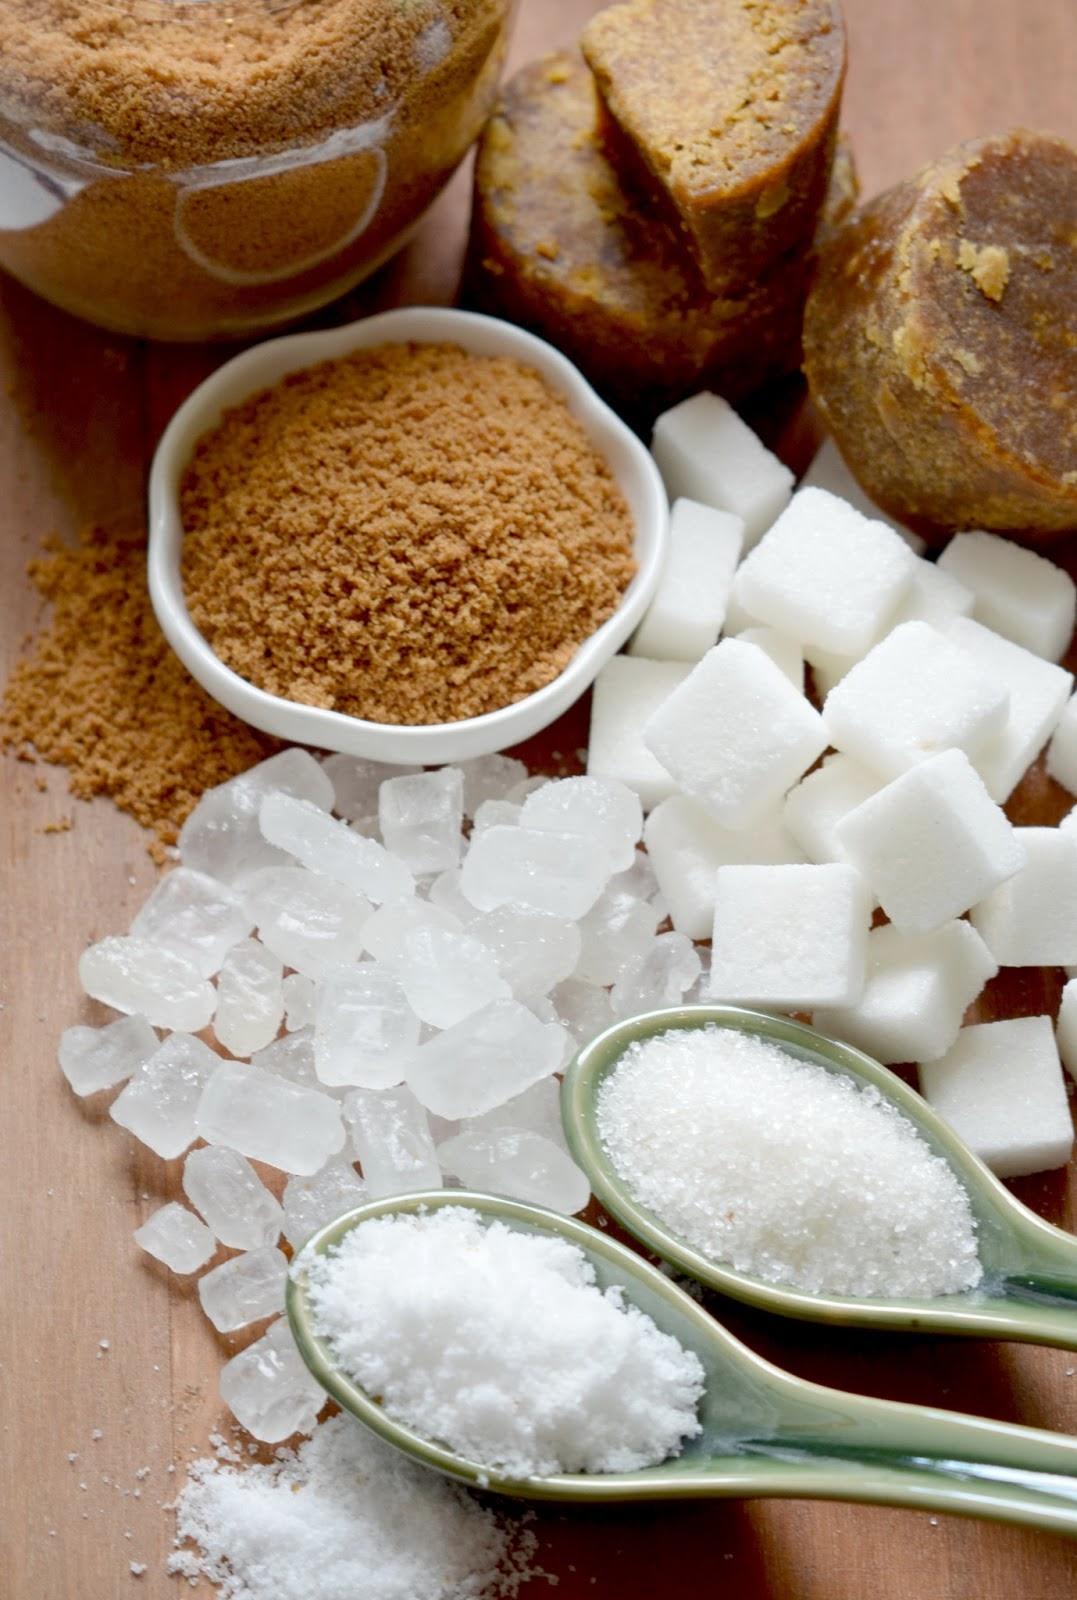 Ragam Gula Indonesia